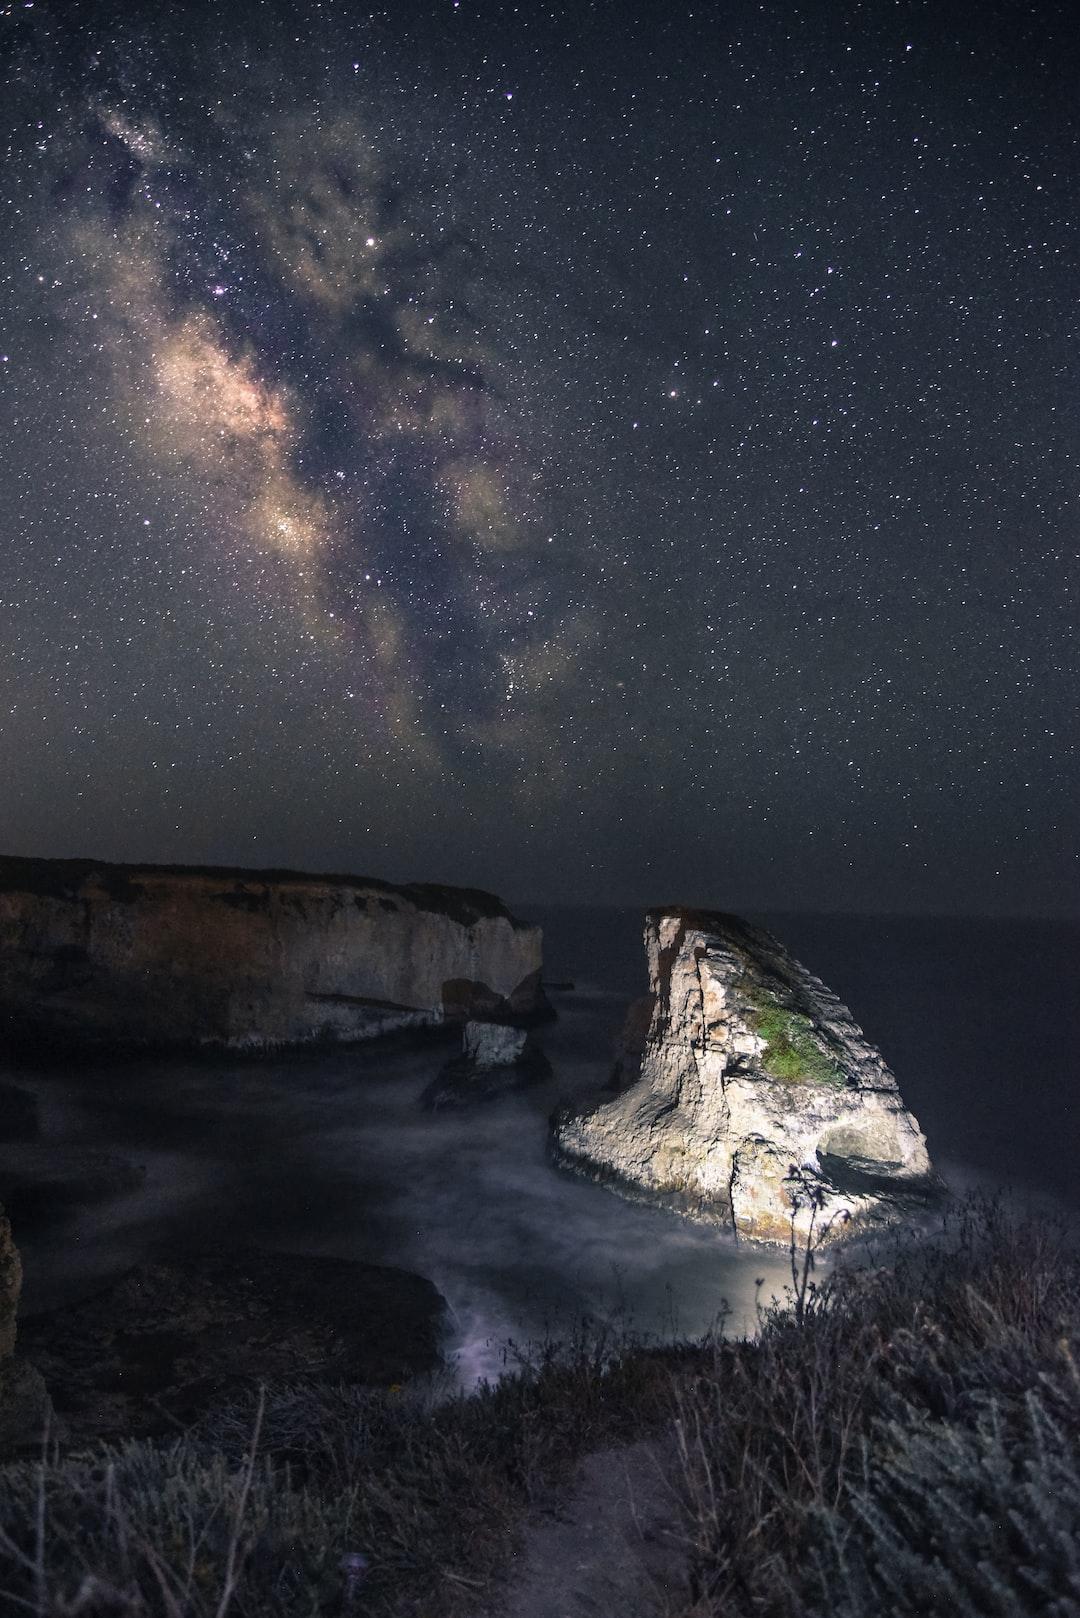 Shark Fin Cove Under the Night Sky